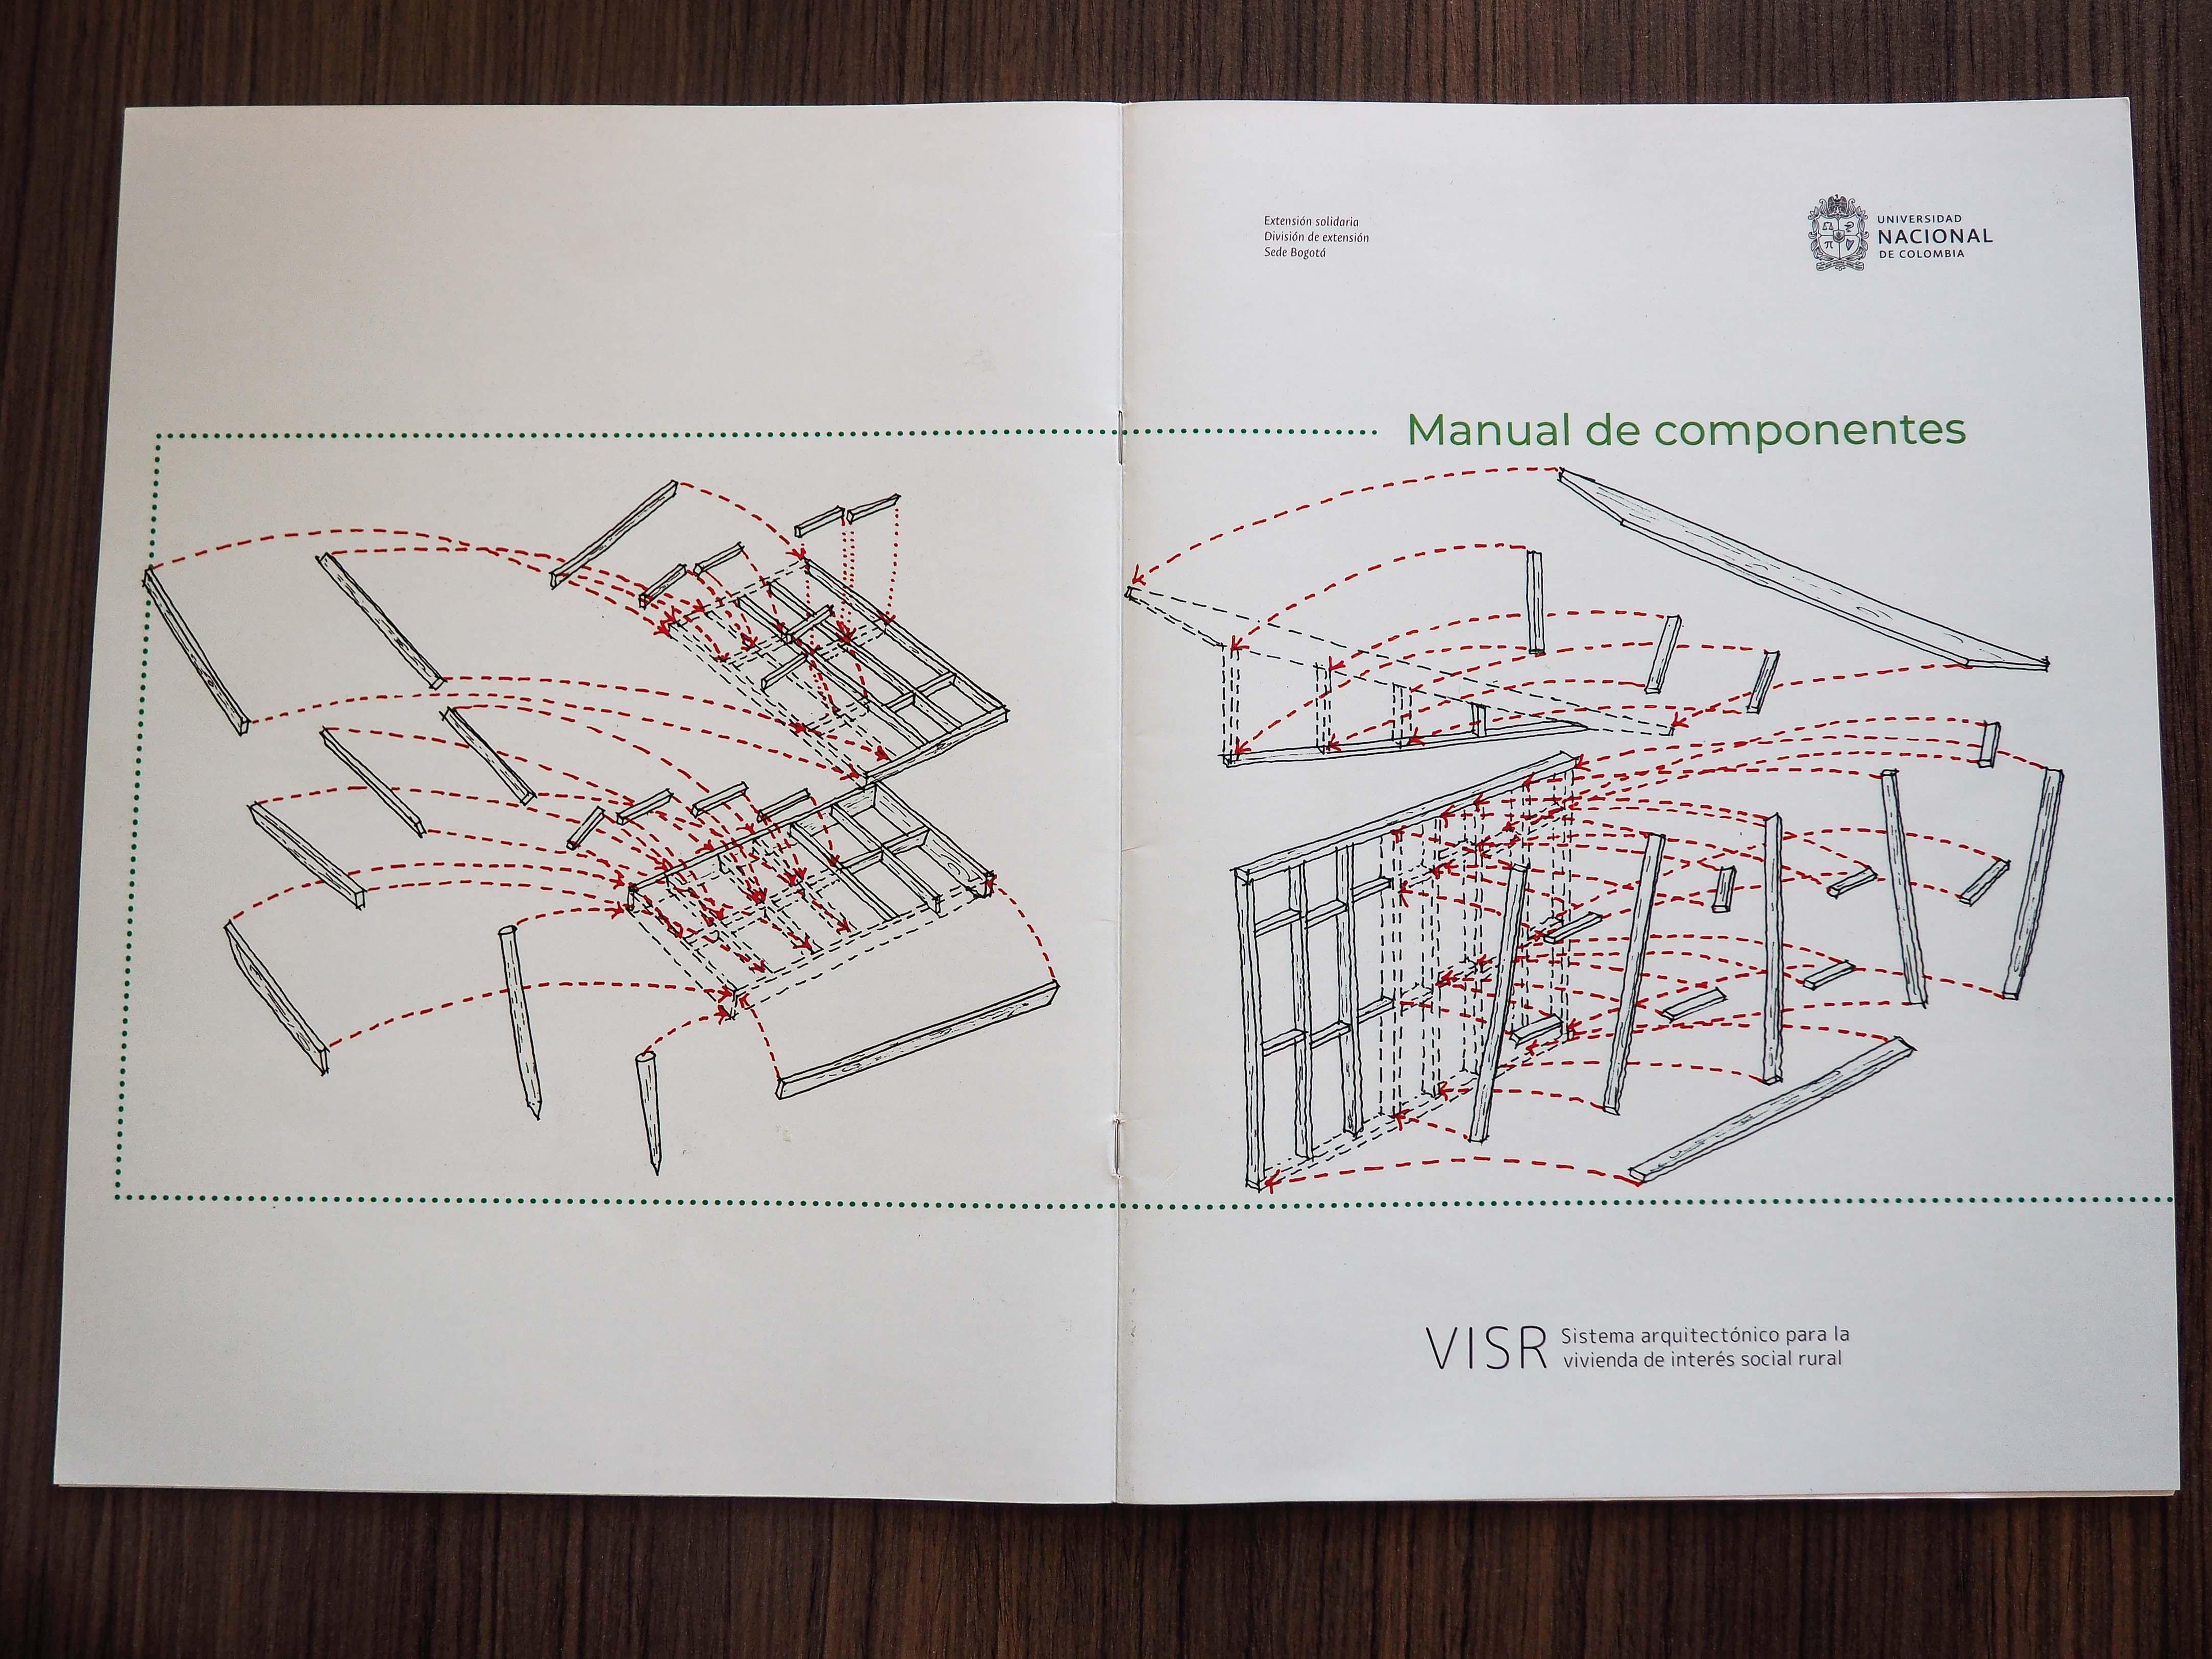 Visr_Arquitectura_social-1